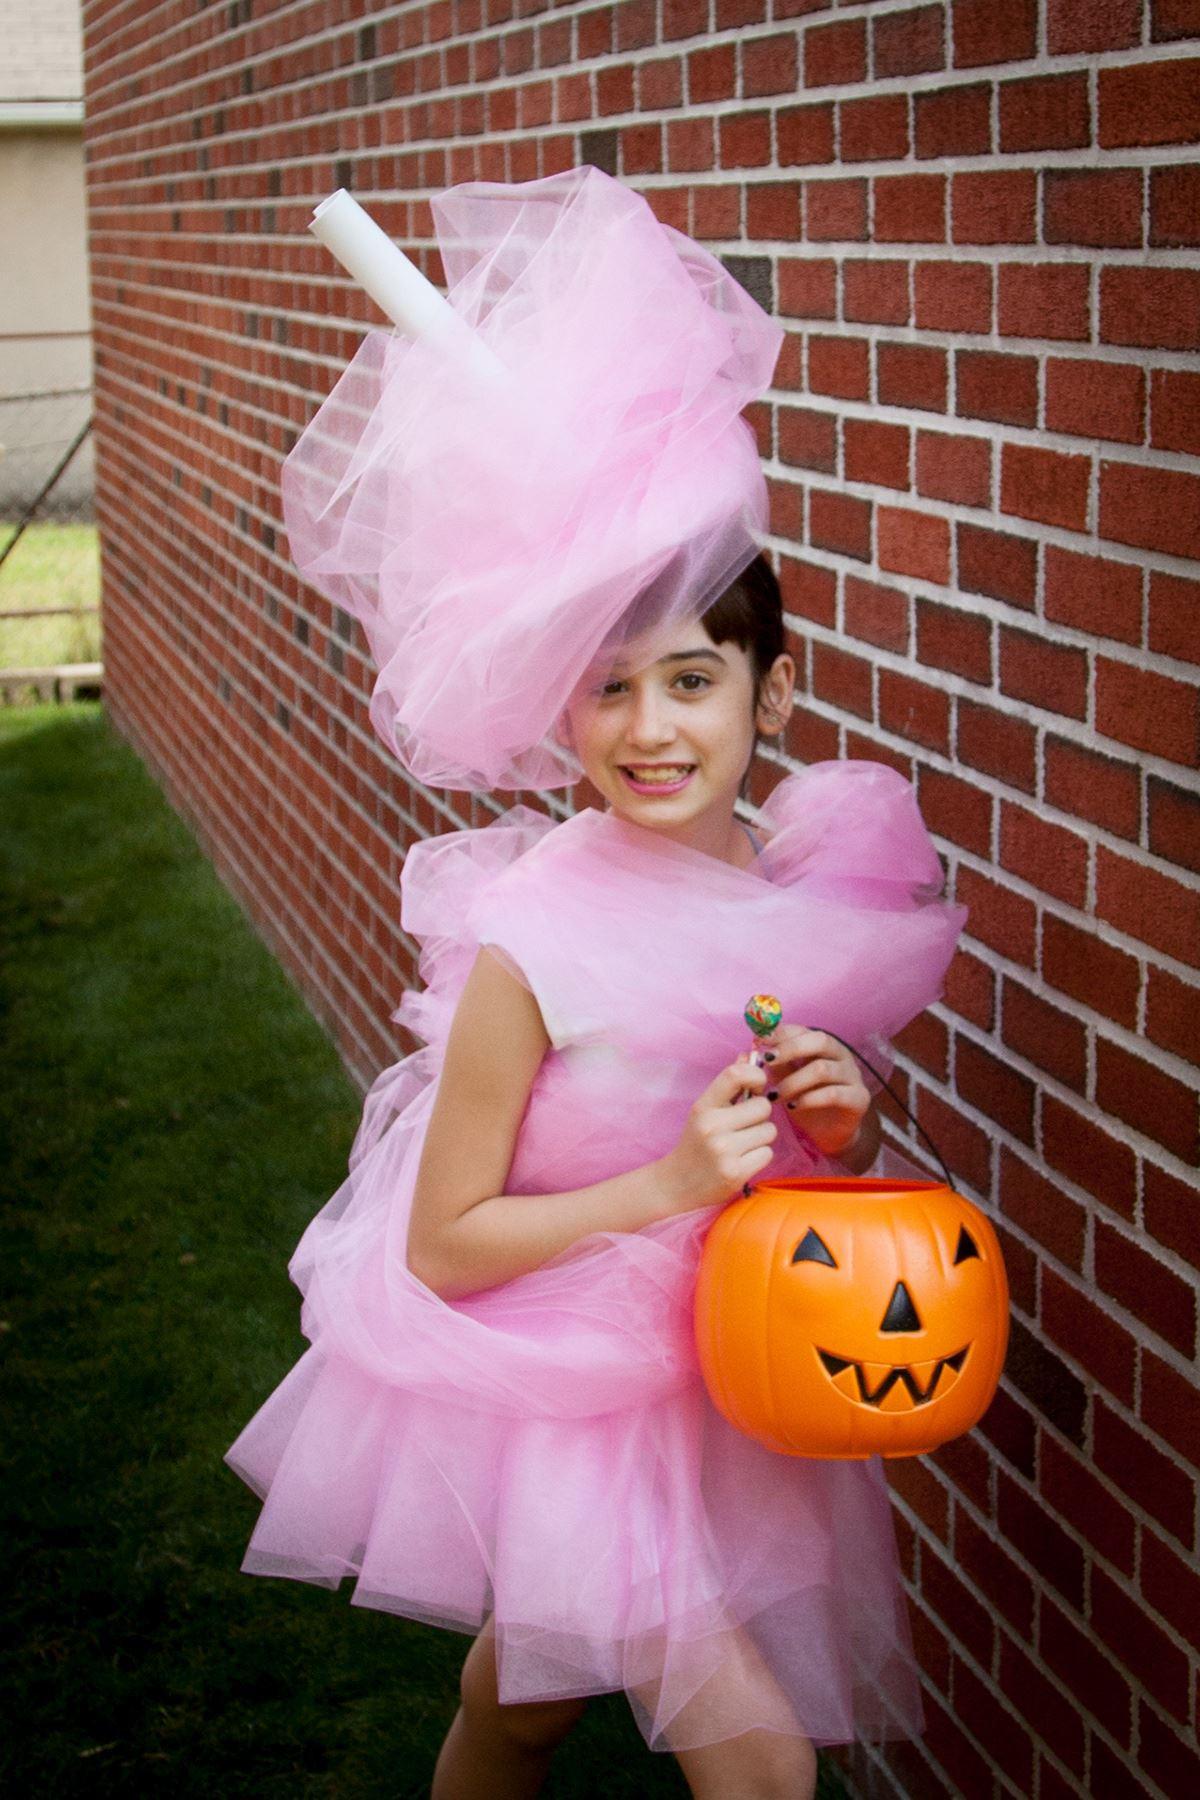 Candy Costumes DIY  Aleene's Original Glues DIY Cotton Candy Costume